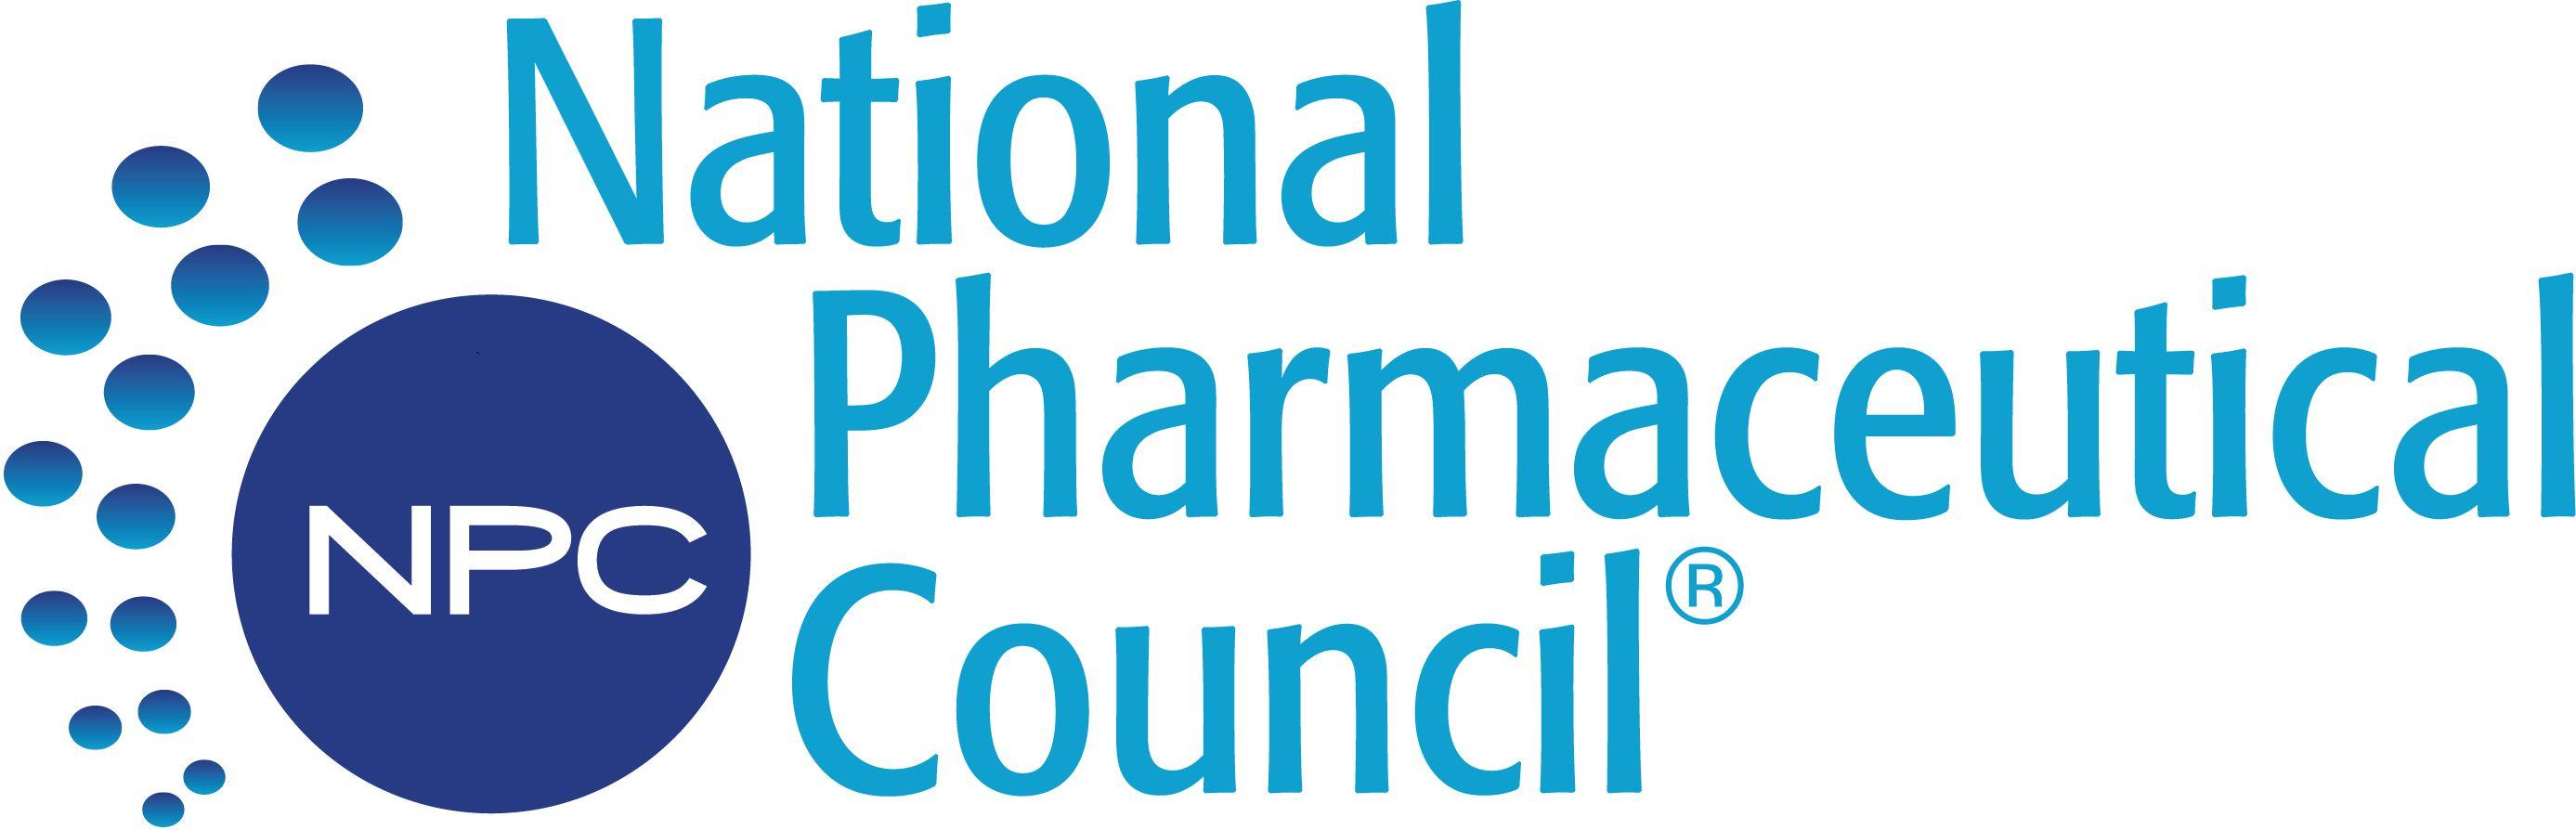 National Pharmaceutical Council logo